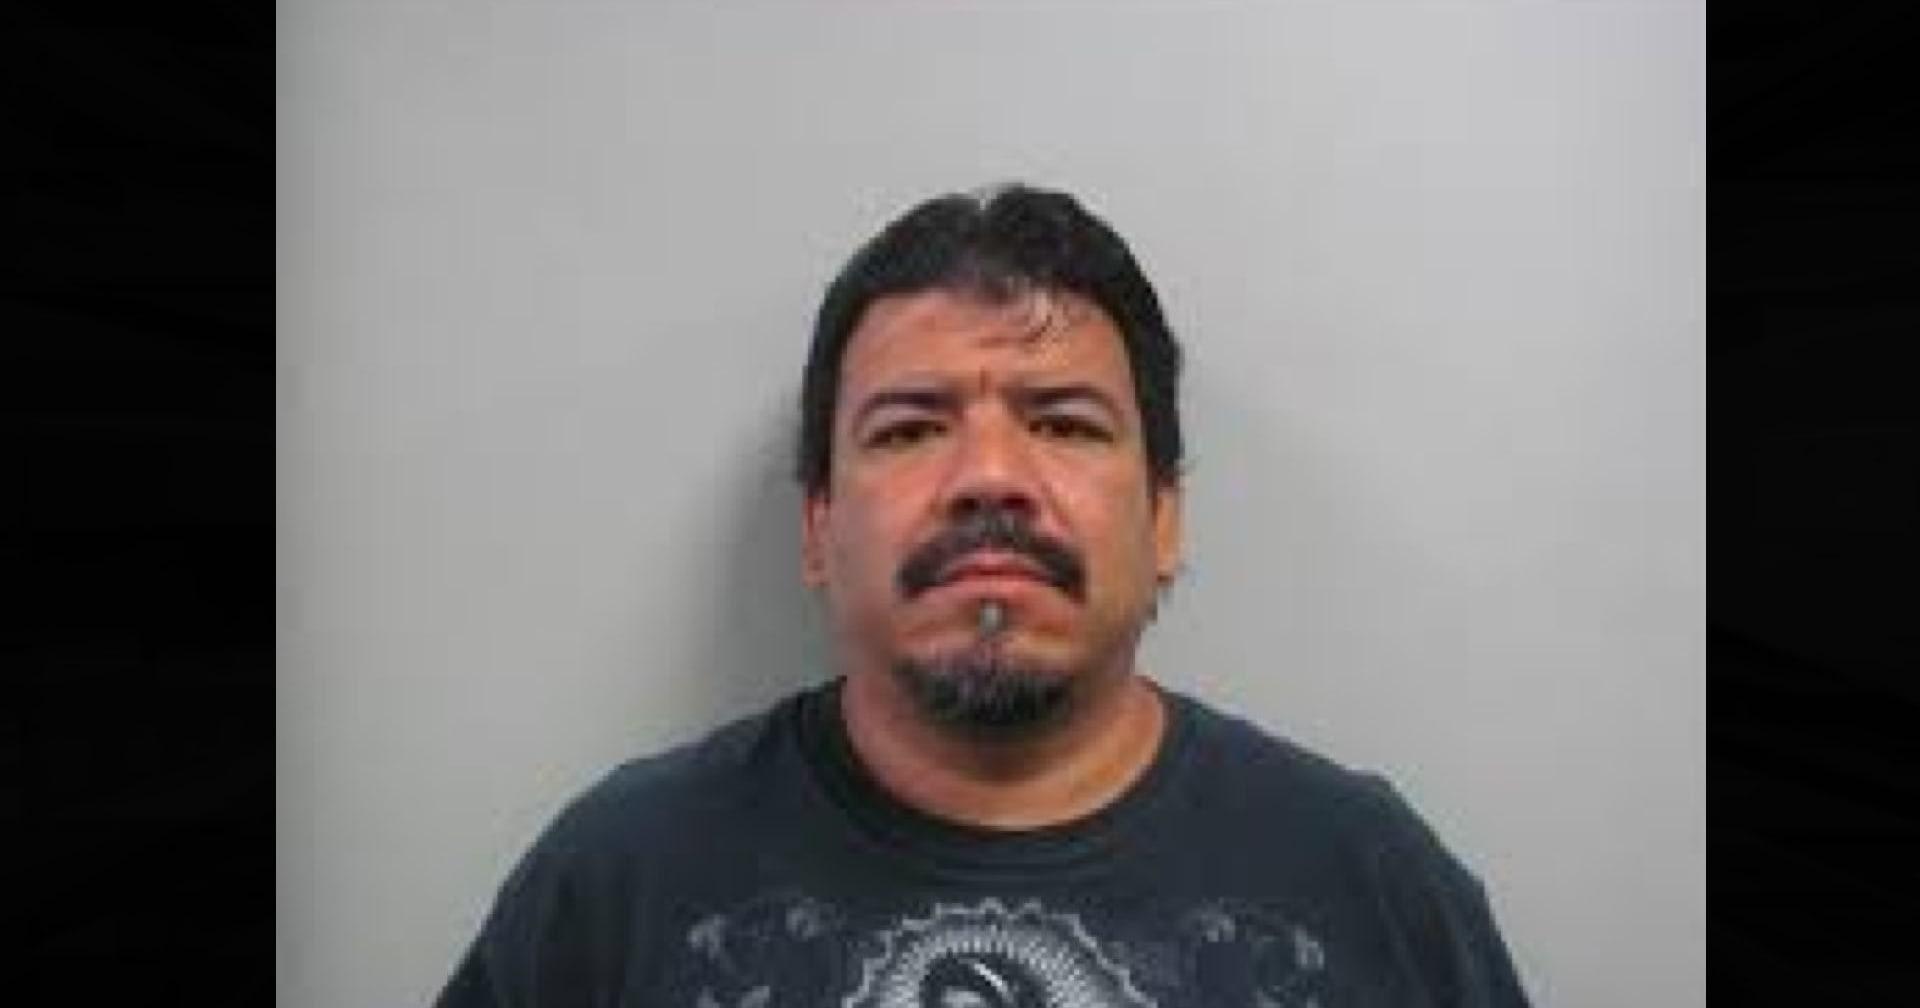 c922e9f18 Detienen en Walmart a agresor sexual que presuntamente fotografió a ...